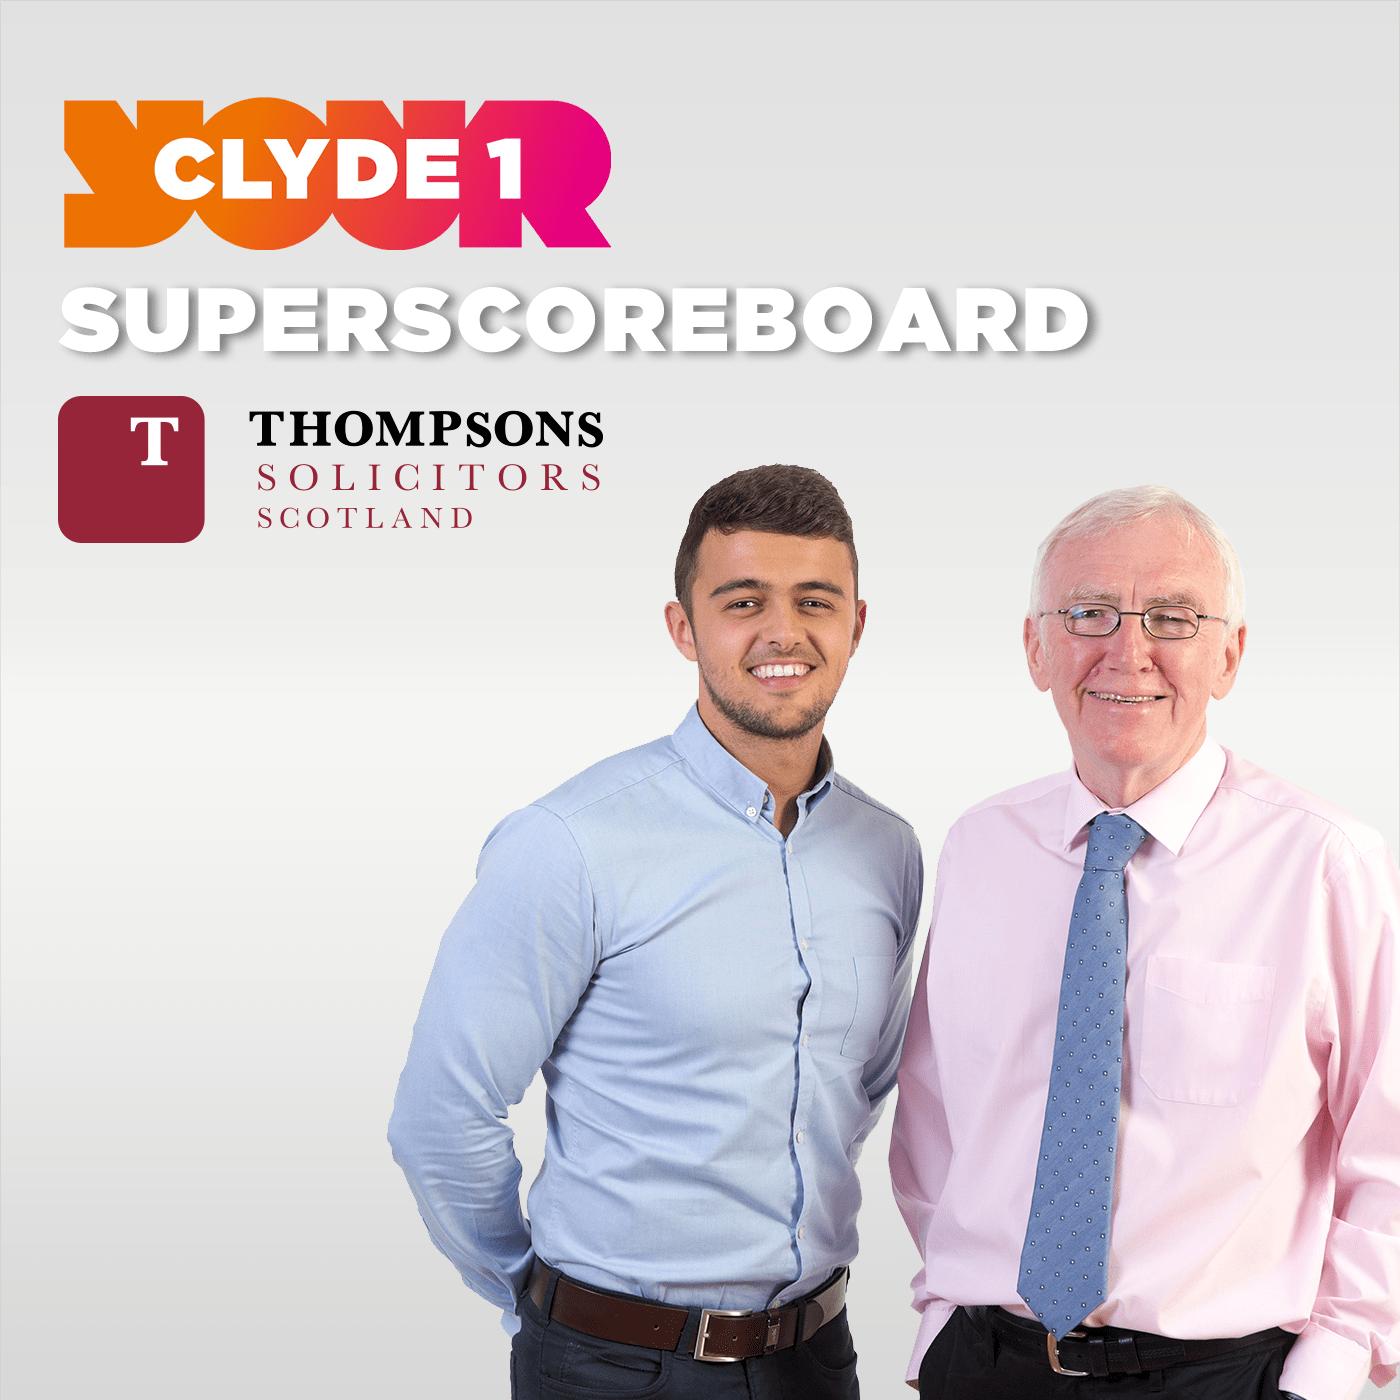 Monday 22nd April Clyde 1 Superscoreboard